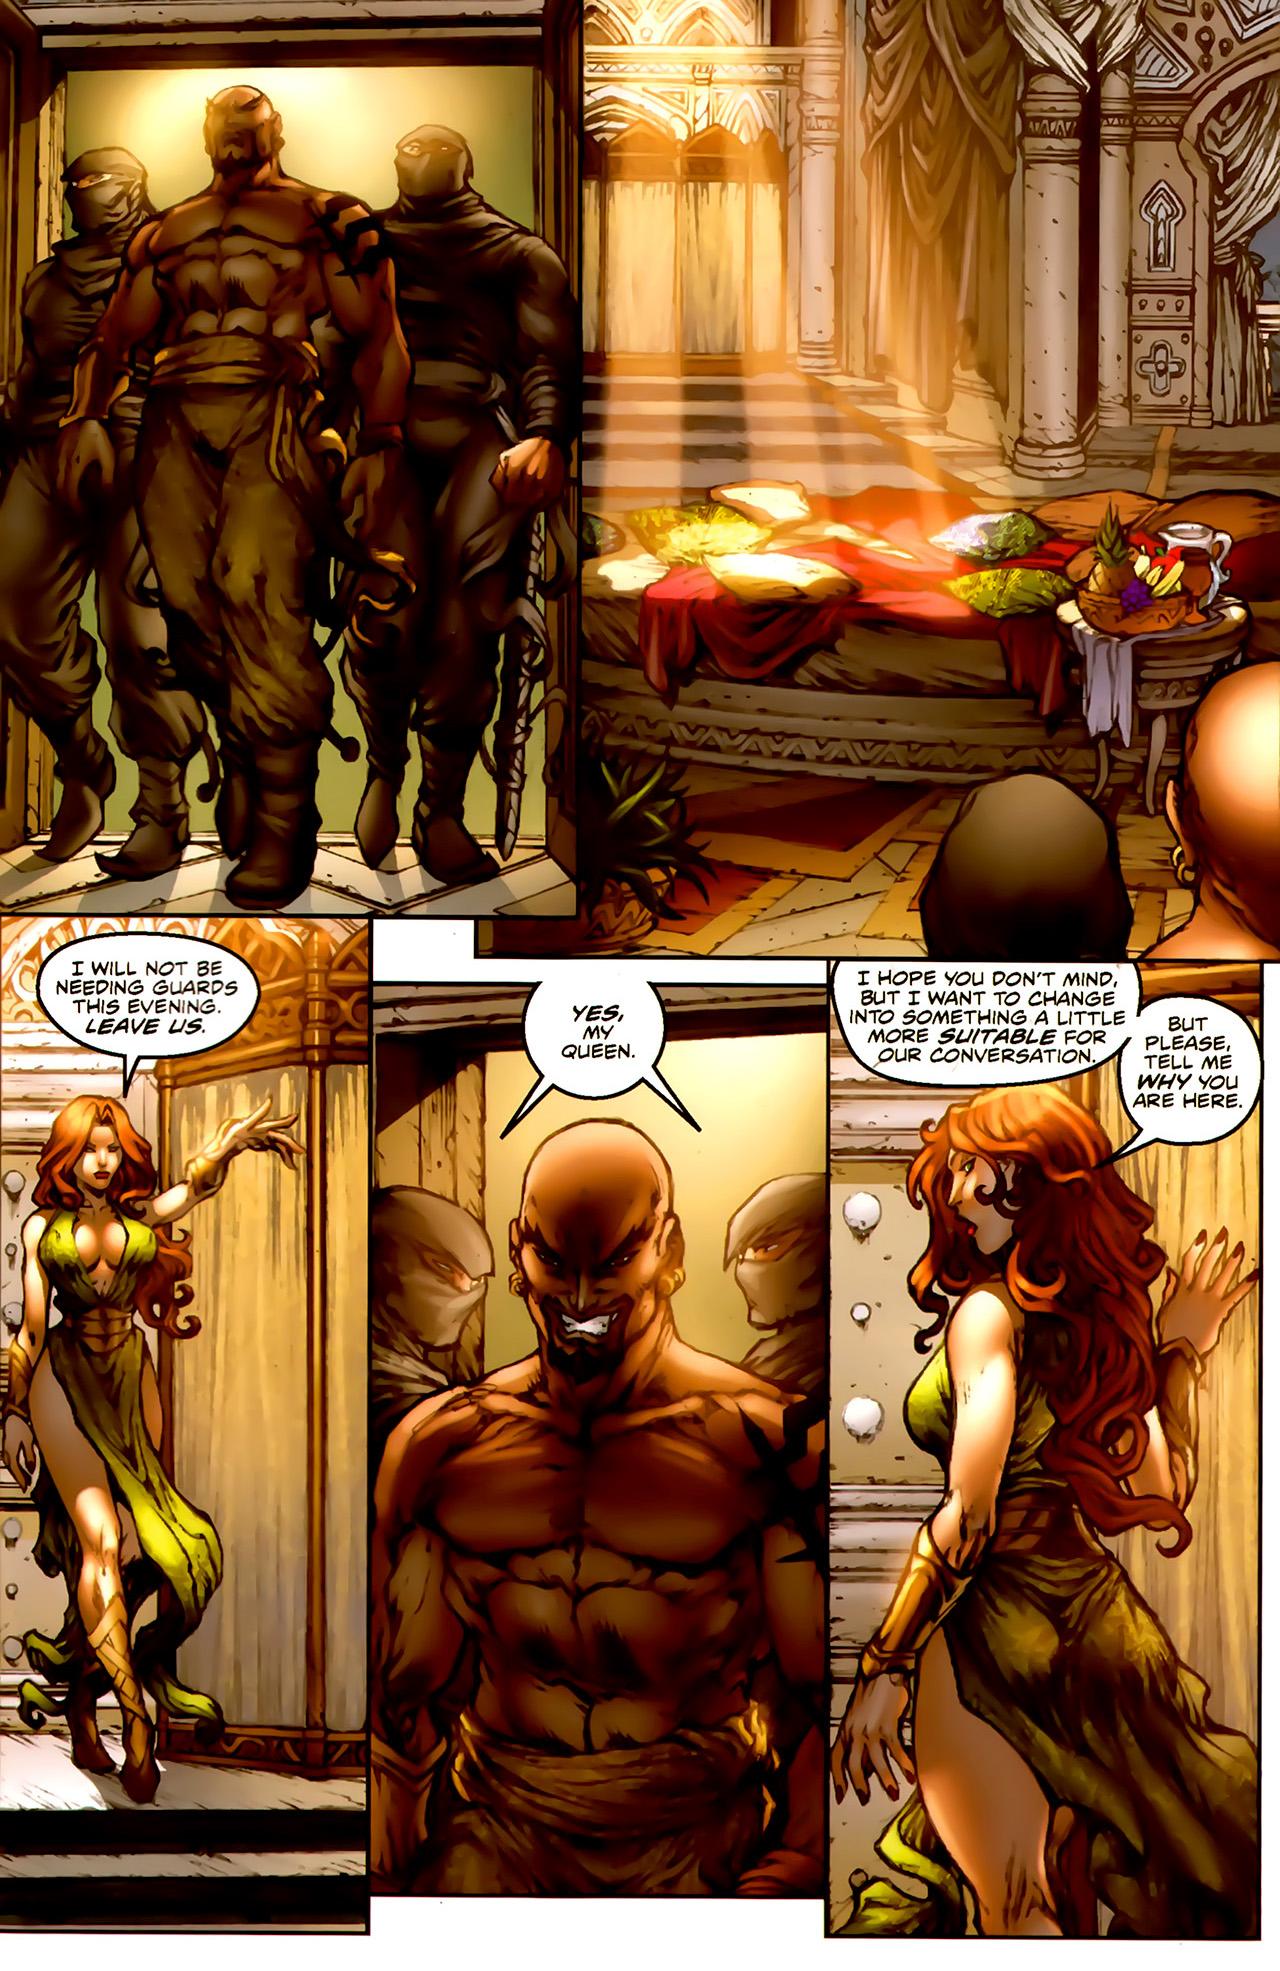 Read online 1001 Arabian Nights: The Adventures of Sinbad comic -  Issue #1 - 24